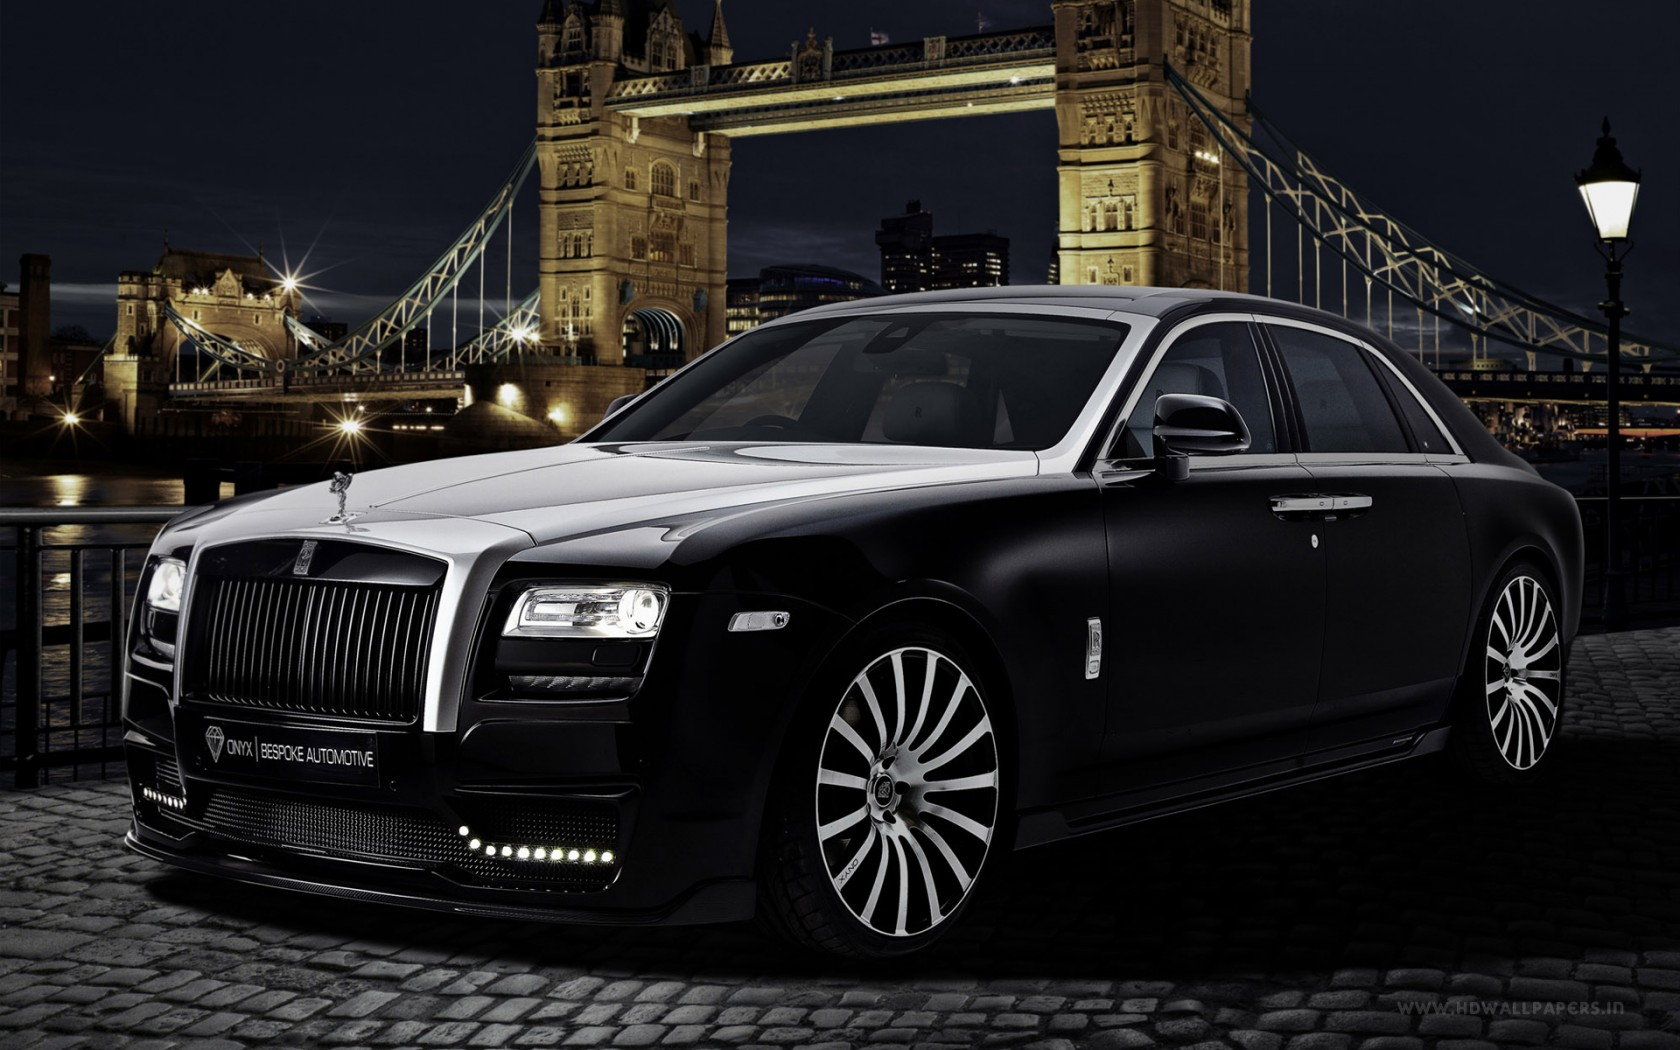 2015 Rolls Royce Phantom Limelight Wallpaper: 2015 Onyx Rolls Royce Ghost San Mortiz Wallpaper